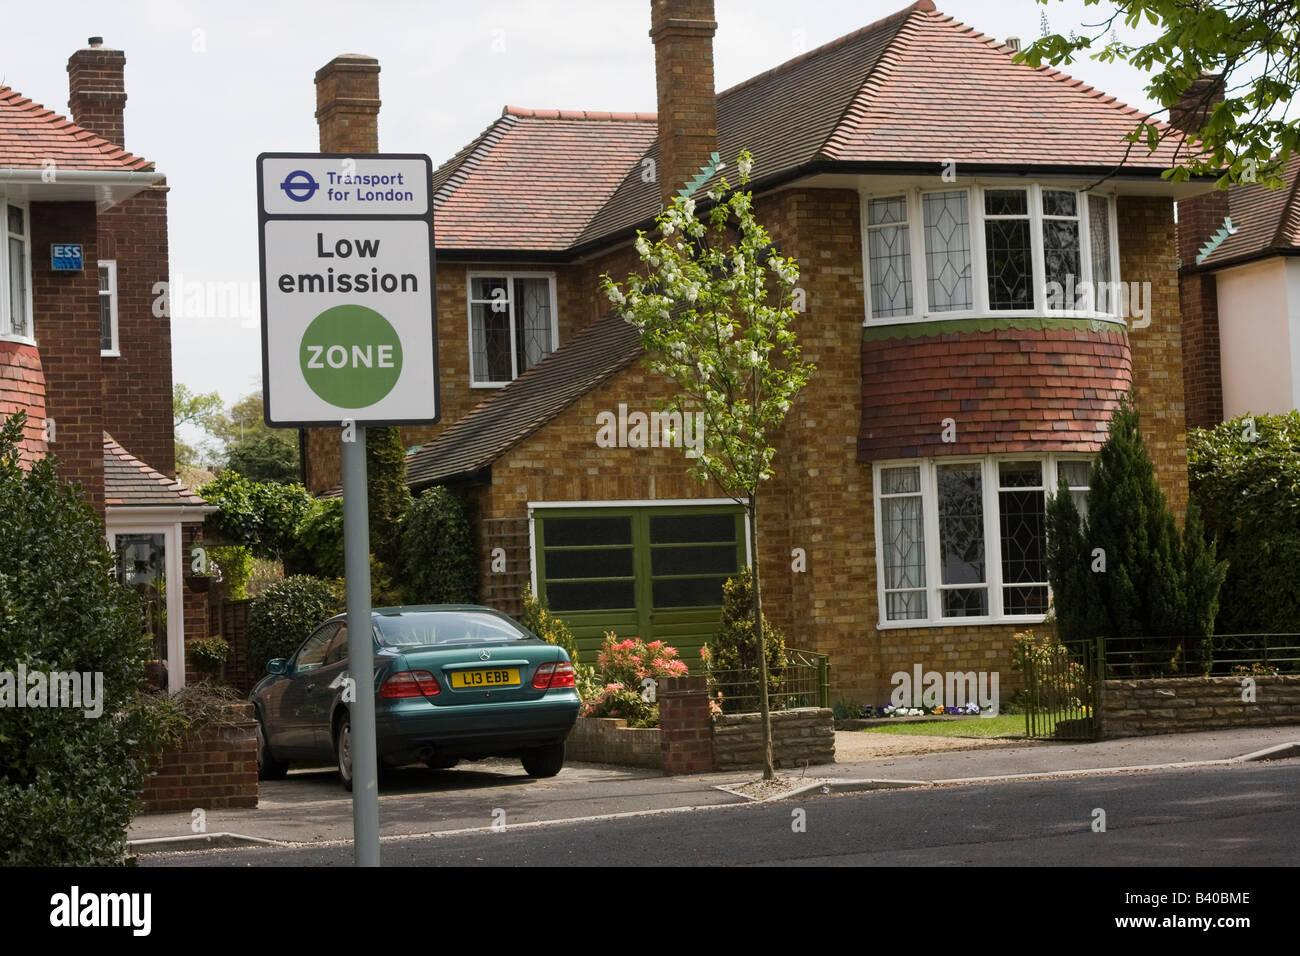 Low emission zone sign TFL 'Transport for London' side road - Stock Image